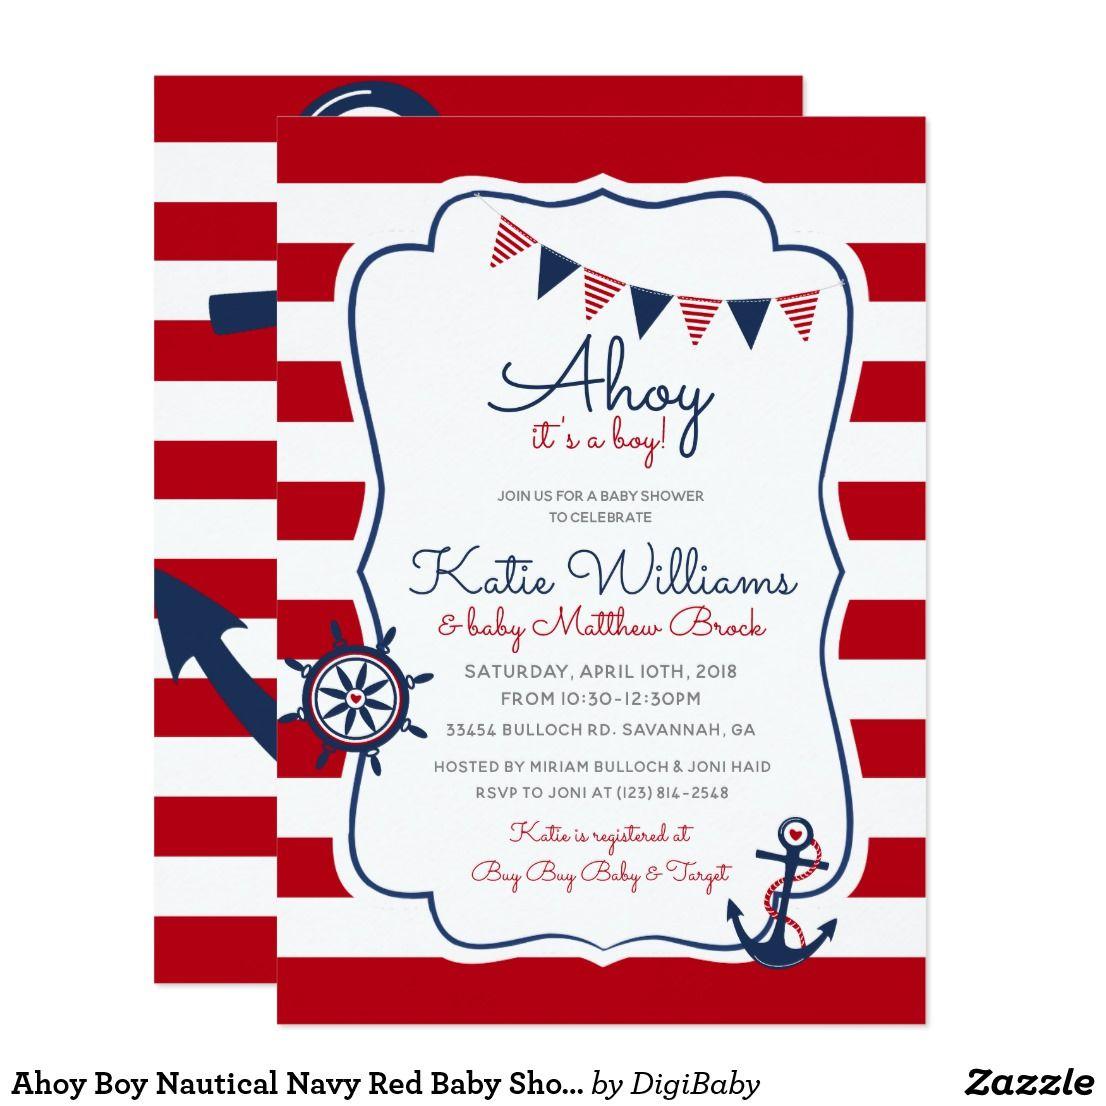 Ahoy Boy Nautical Navy Red Baby Shower Invitation | Shower ...